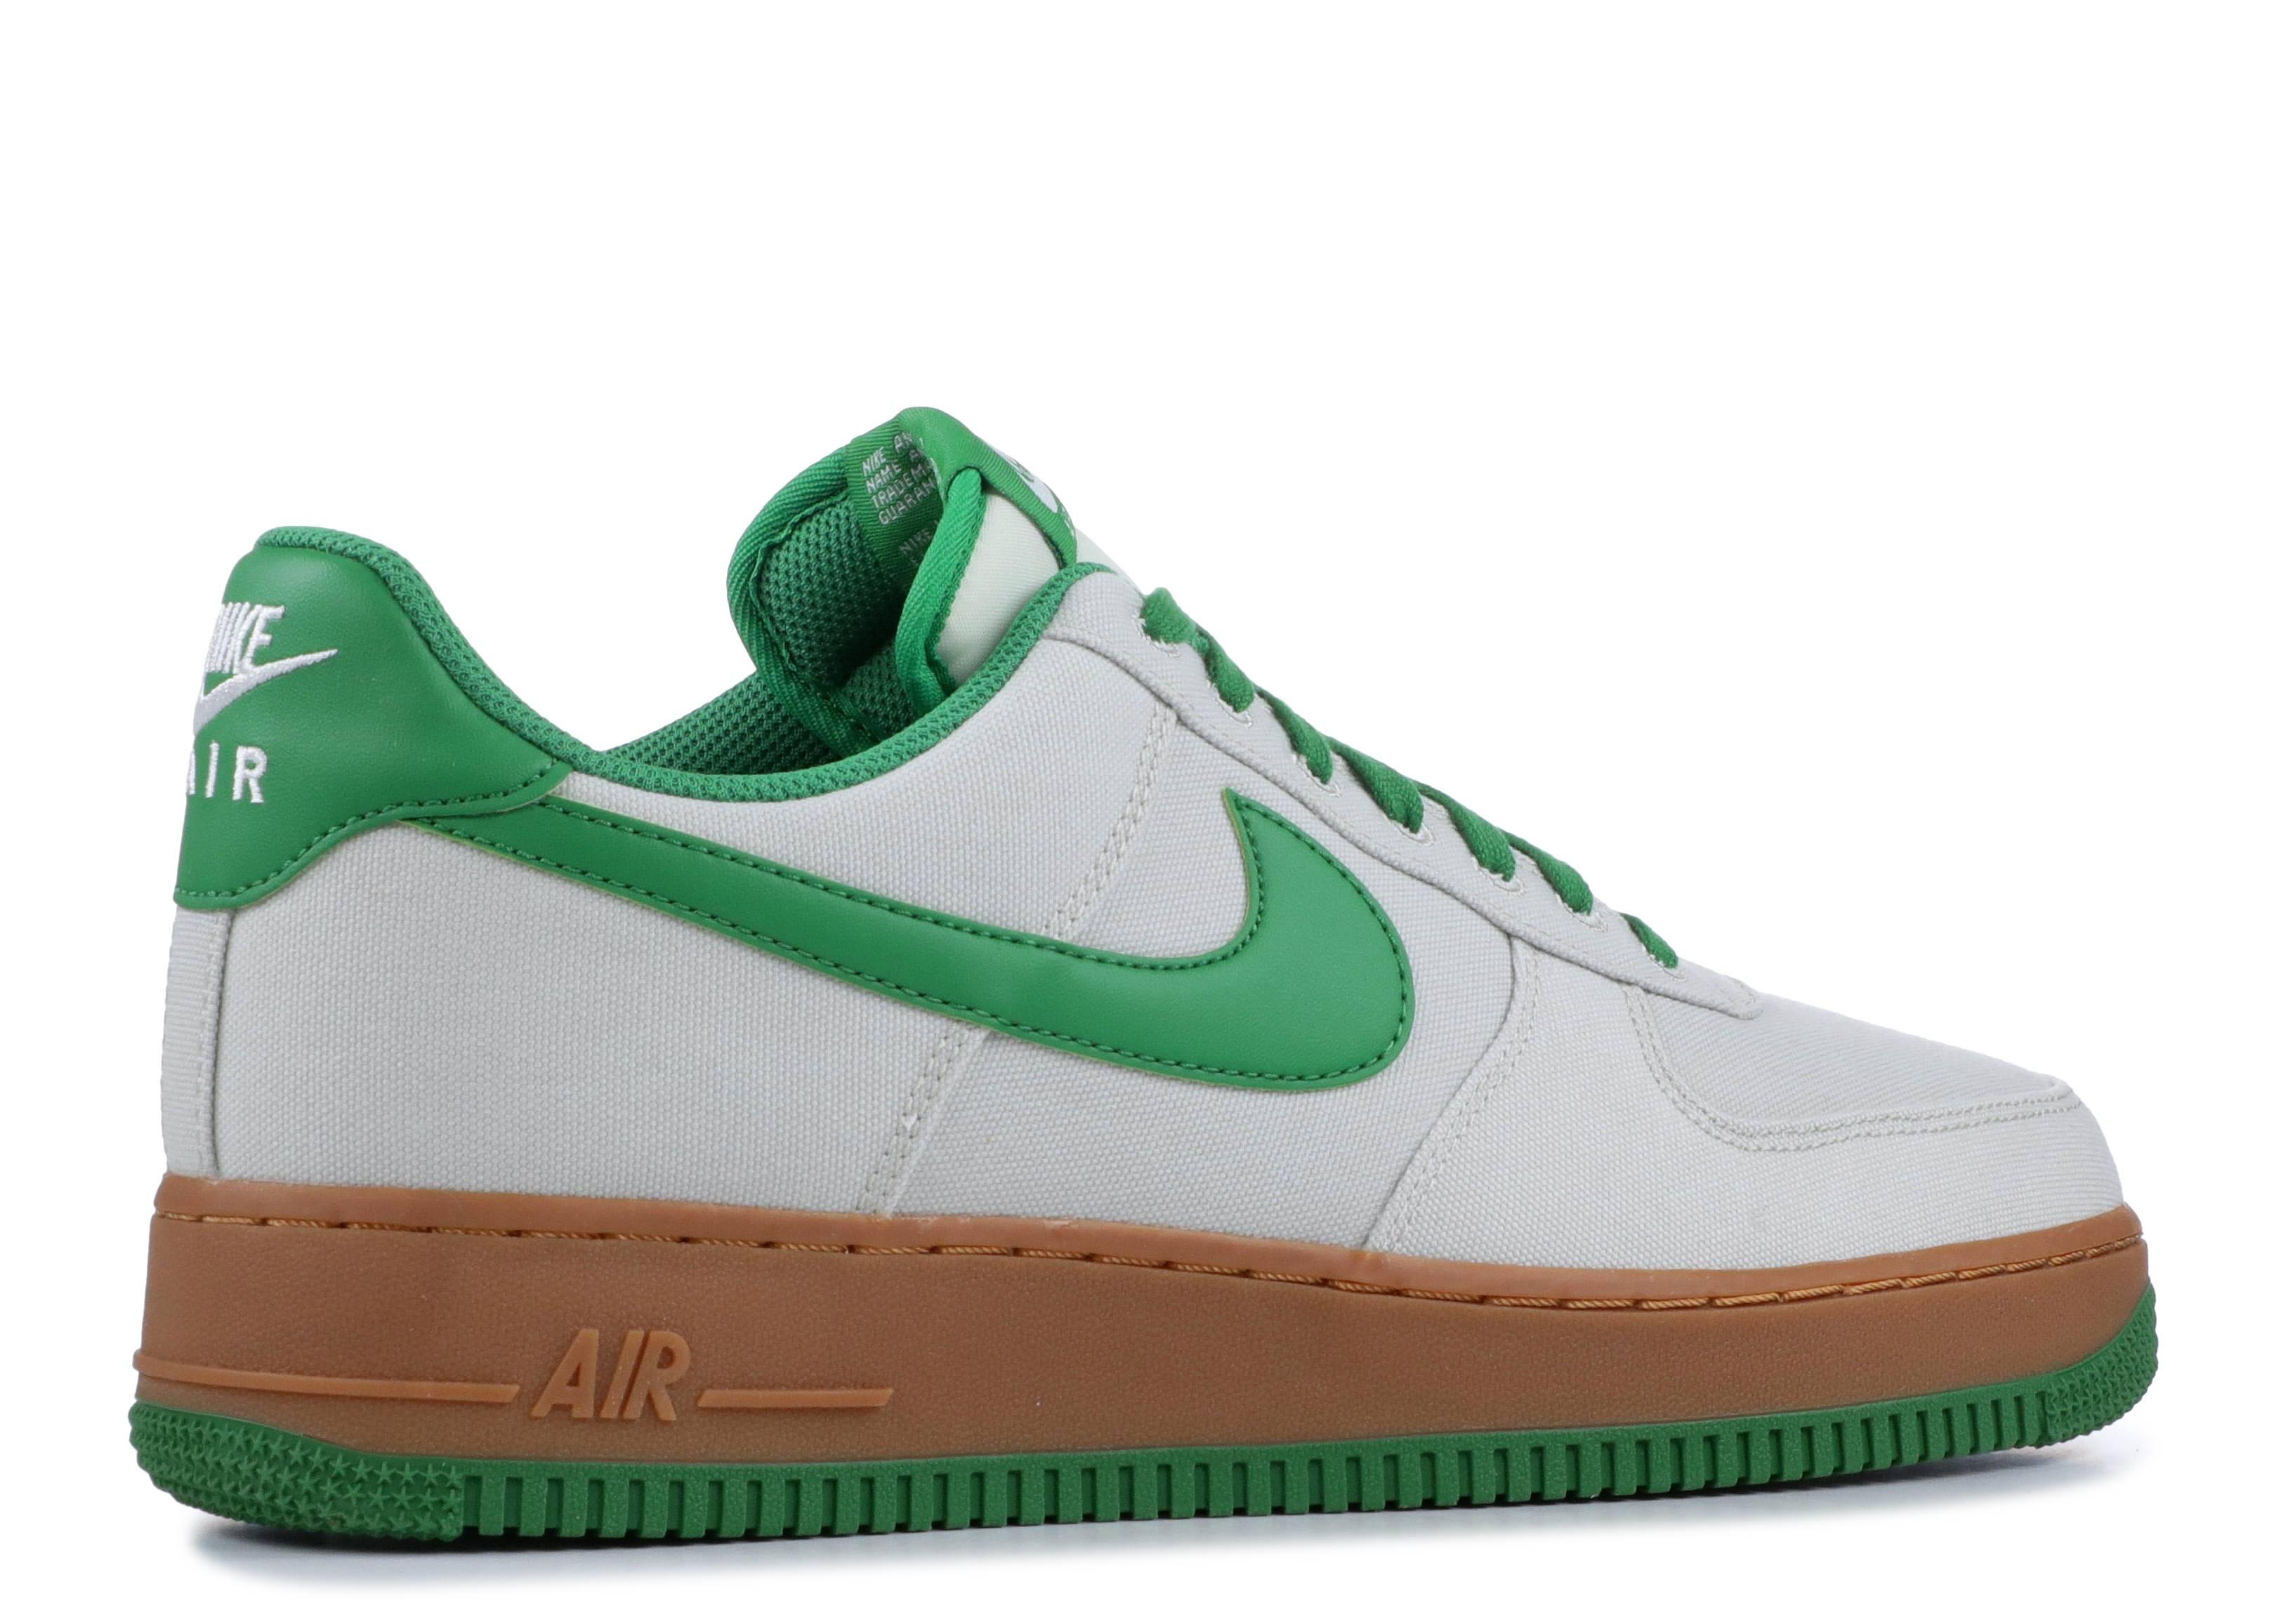 Nike Air Force 1 '07 TXT